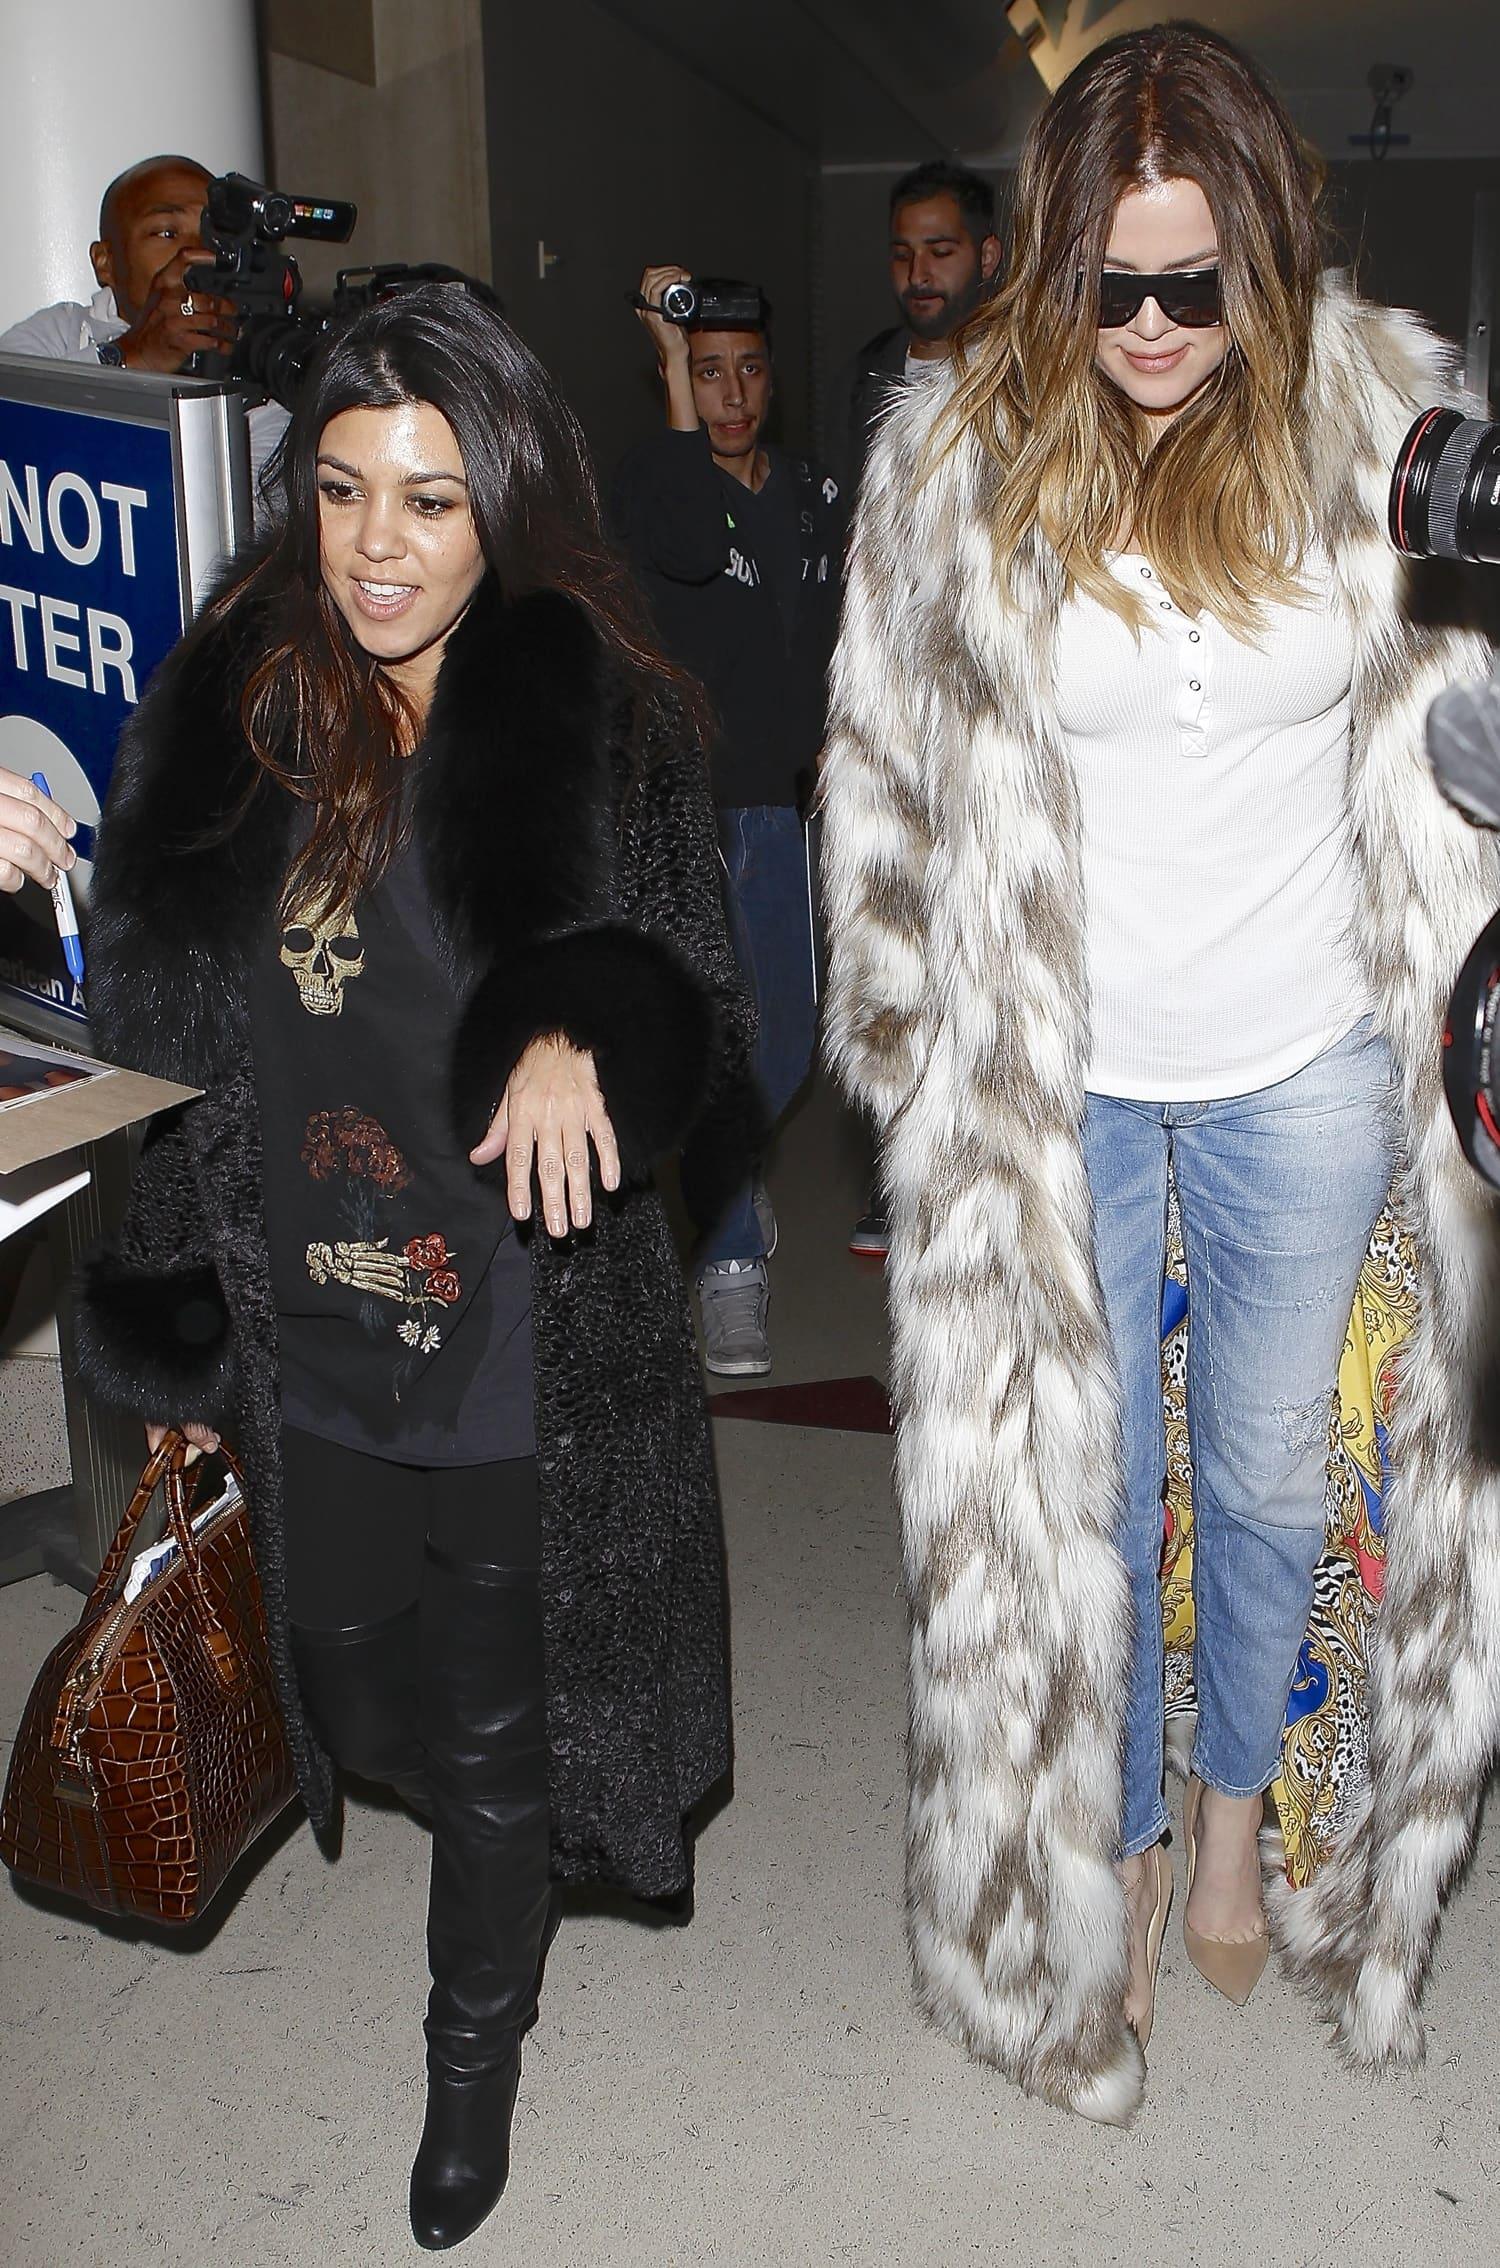 Khloe and Kourtney Kardashian arrive at Los Angeles International (LAX) airport